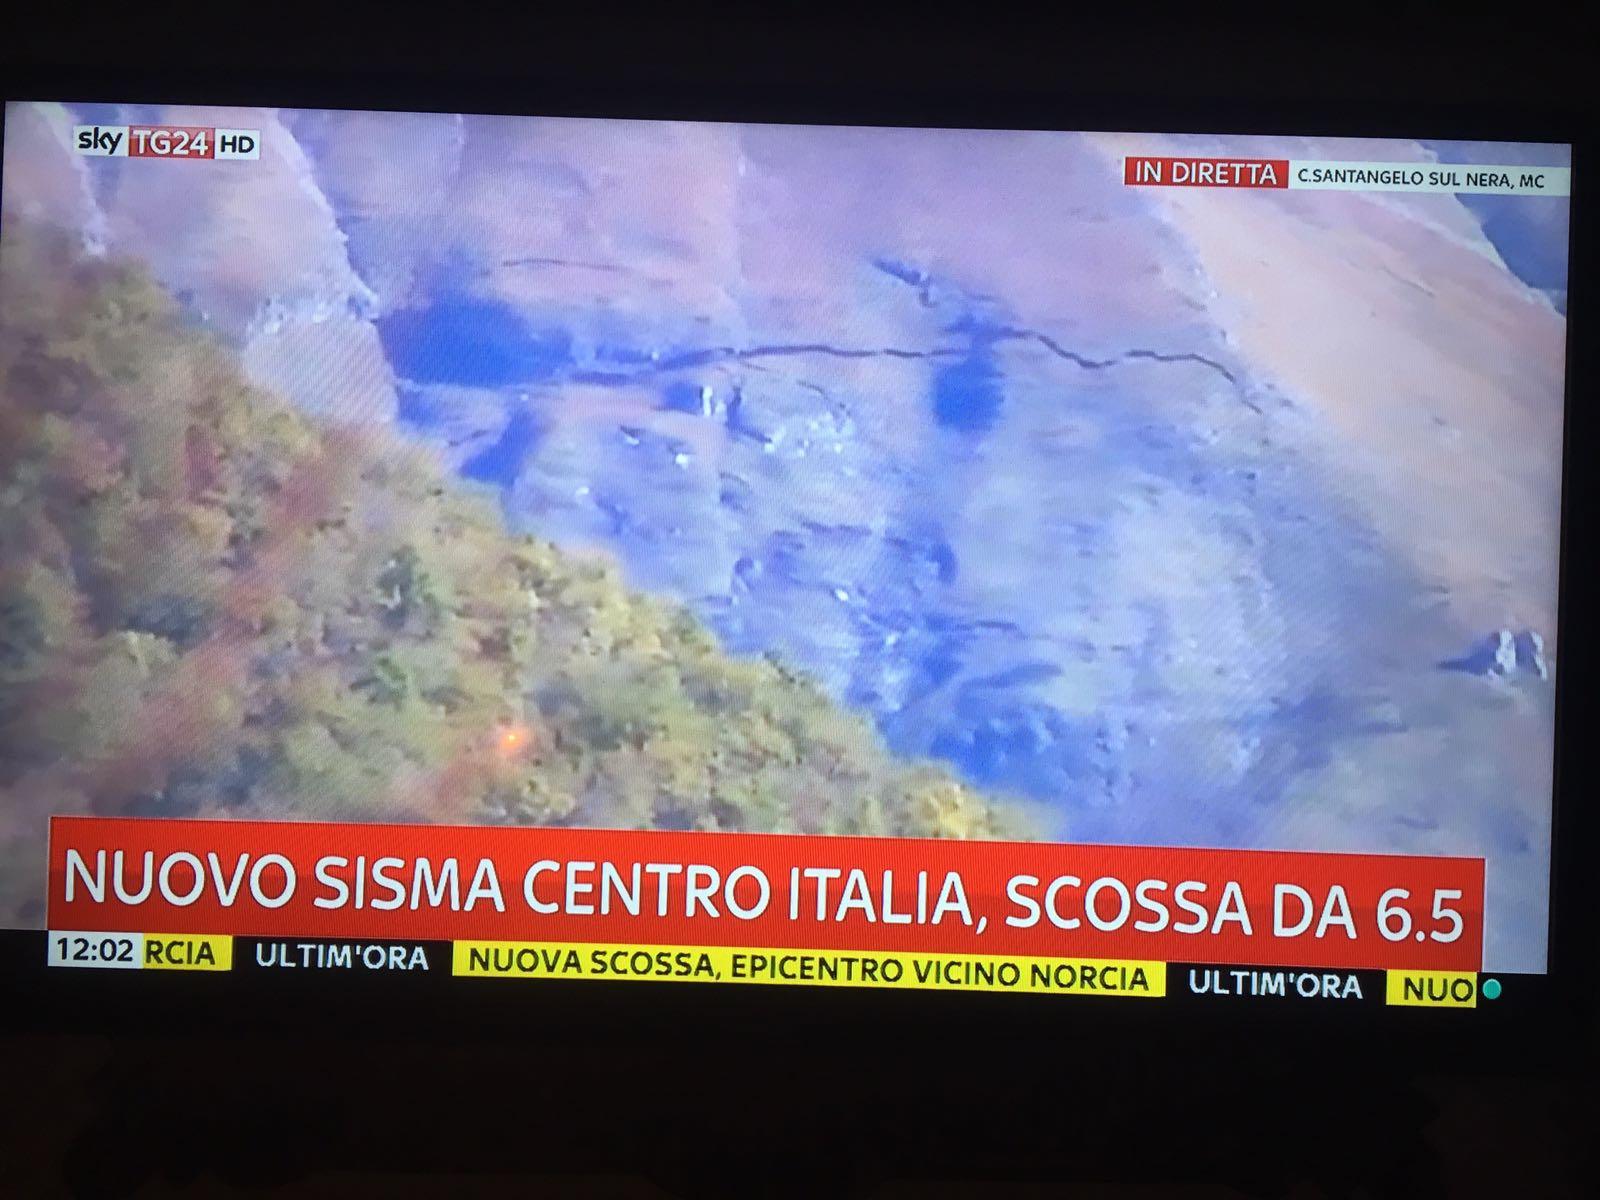 Terremoto Castelsantangelo sul Nera, due scosse in poche ore